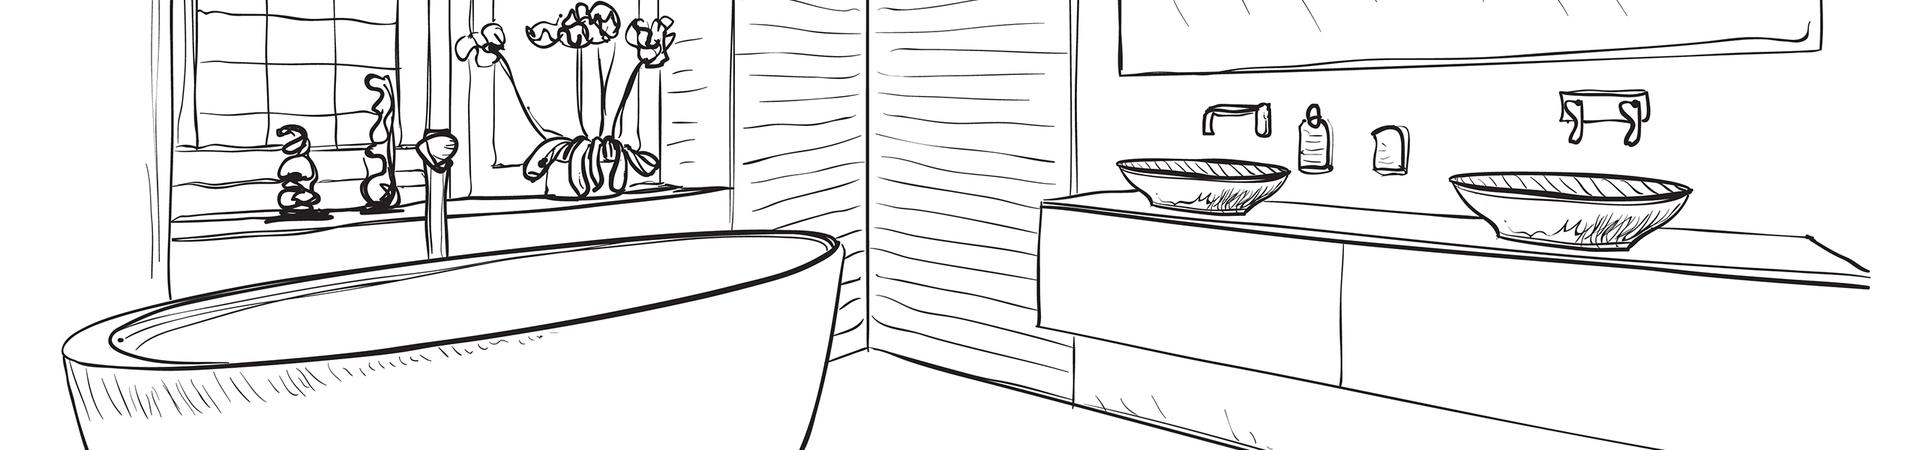 Badkamer schets ontwerp